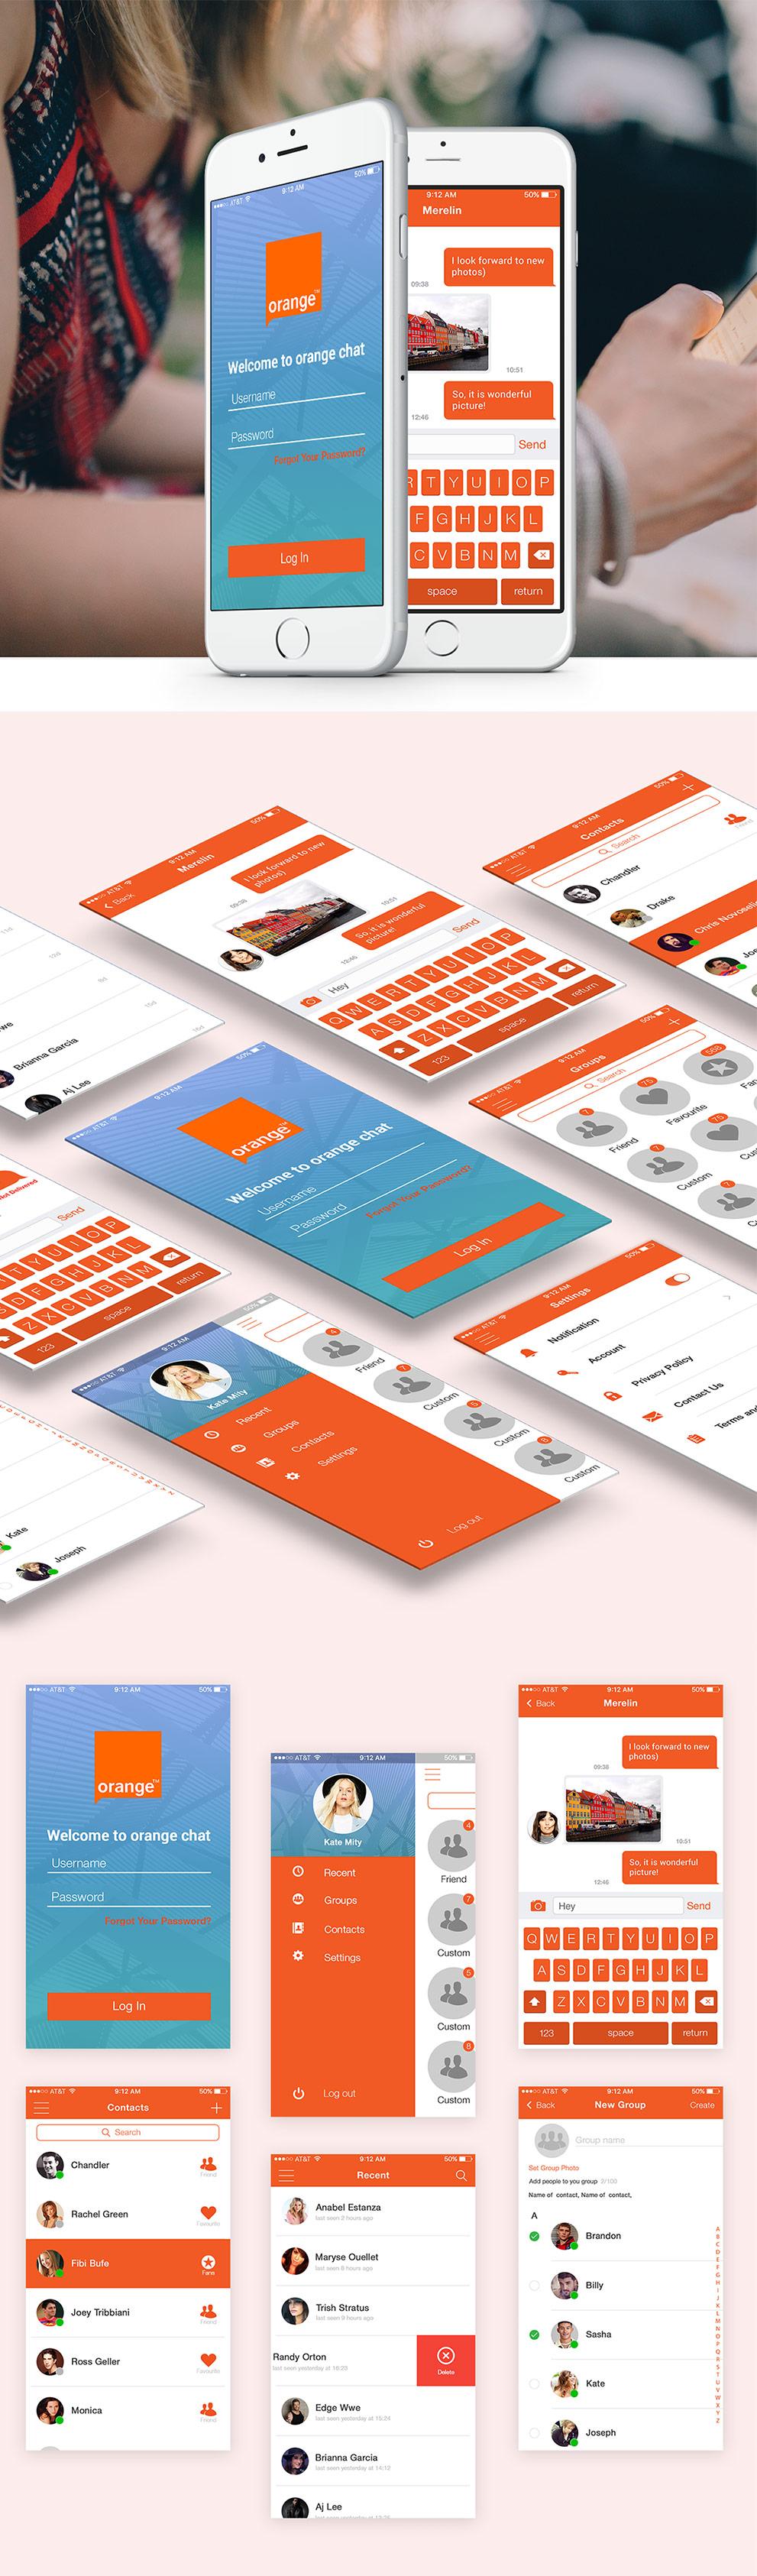 p>Download Mobile Chat Application UI Design Free PSD Set  Modern